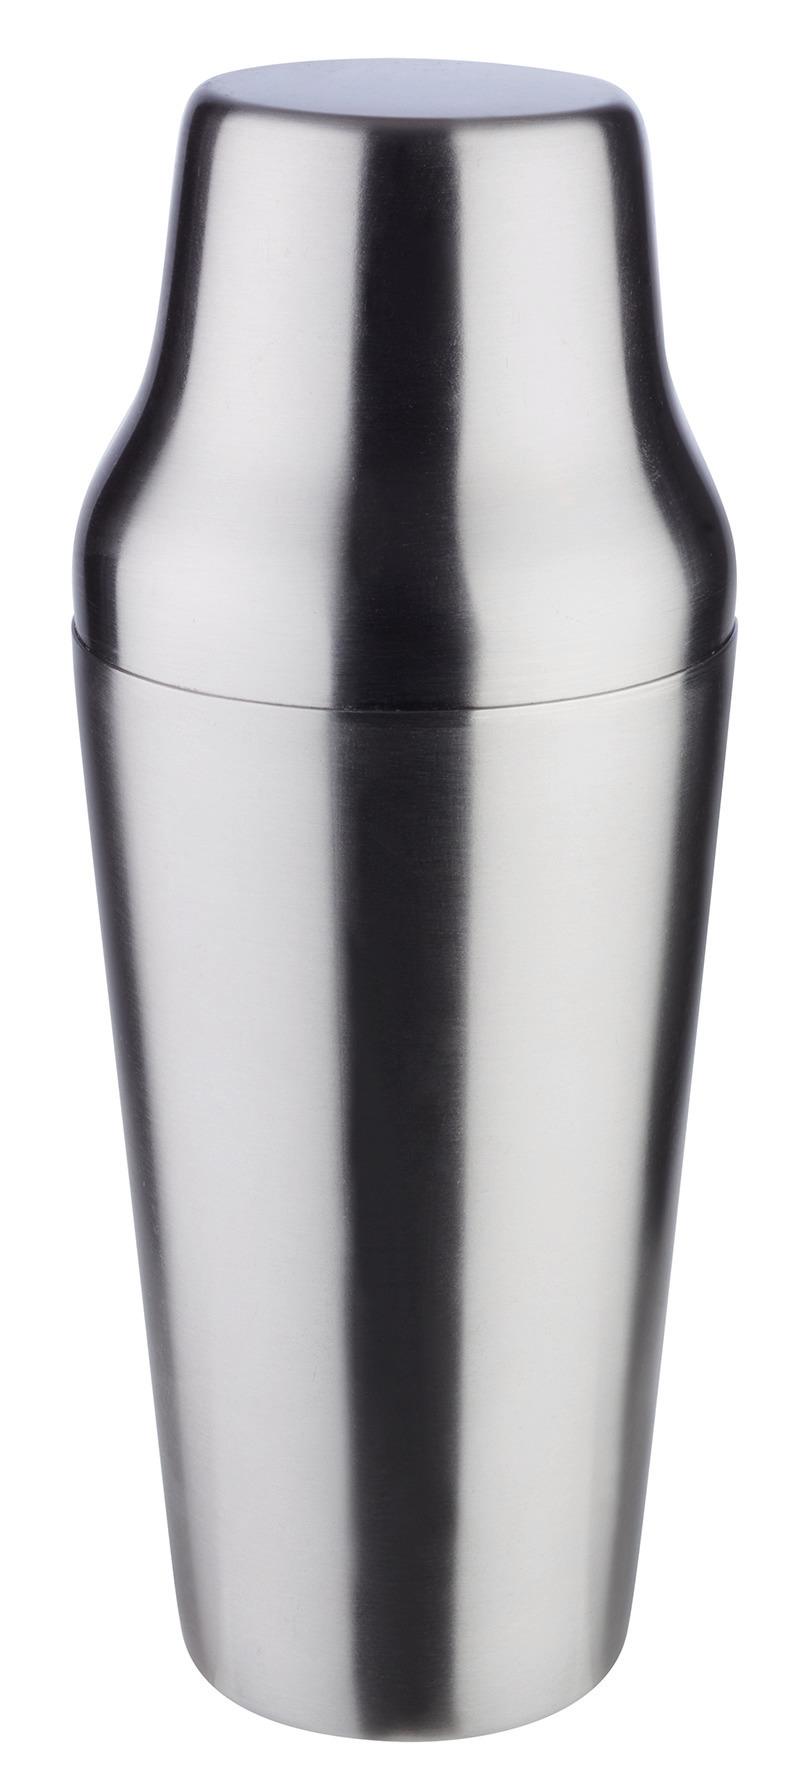 Parisian Shaker rund 0,70 l / 95 mm / 240 mm hoch mattiert